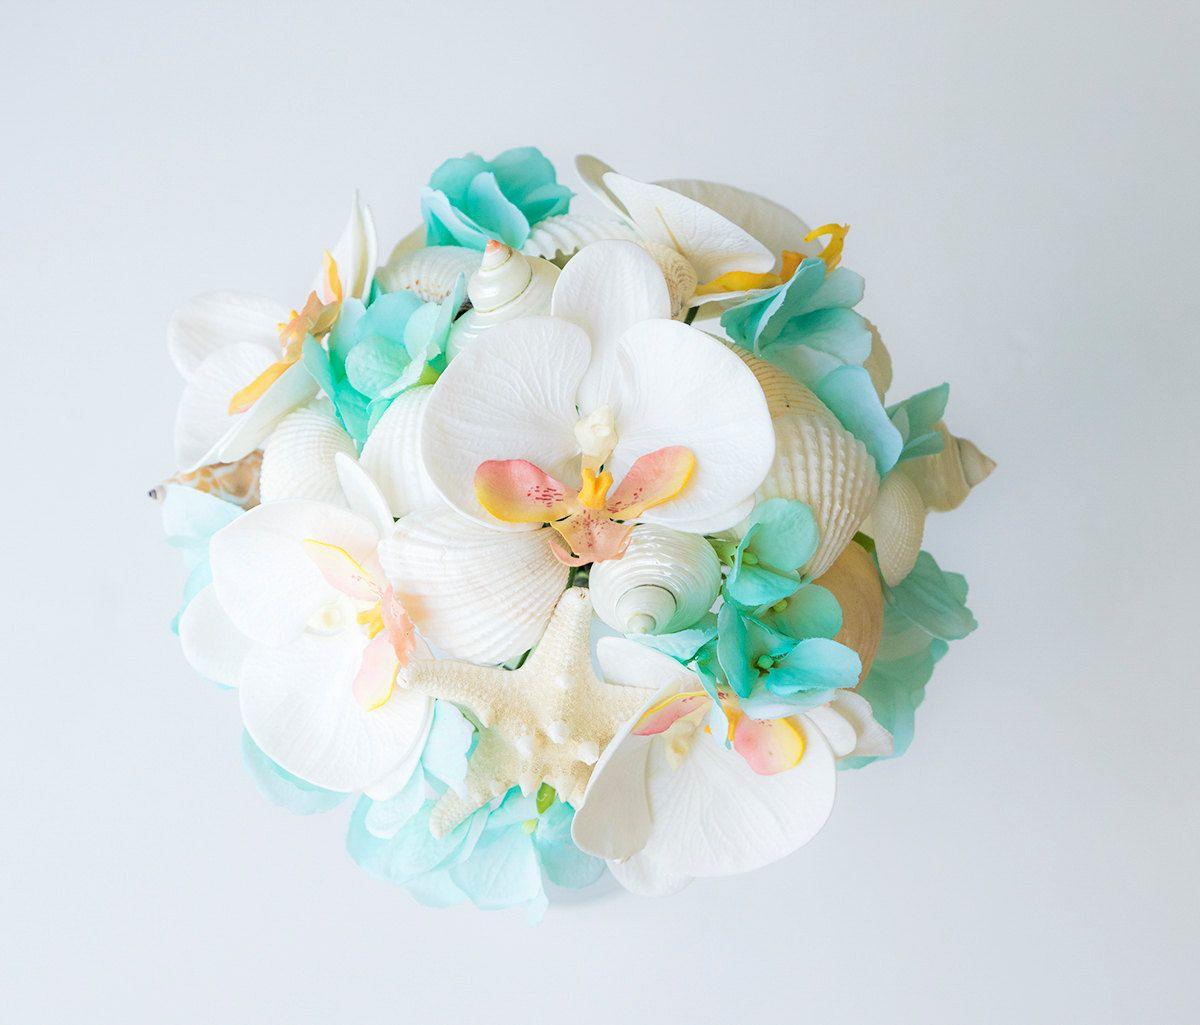 Teal beach wedding  Beach Wedding Turquoise Teal Seashells and Starfish by Wedideas